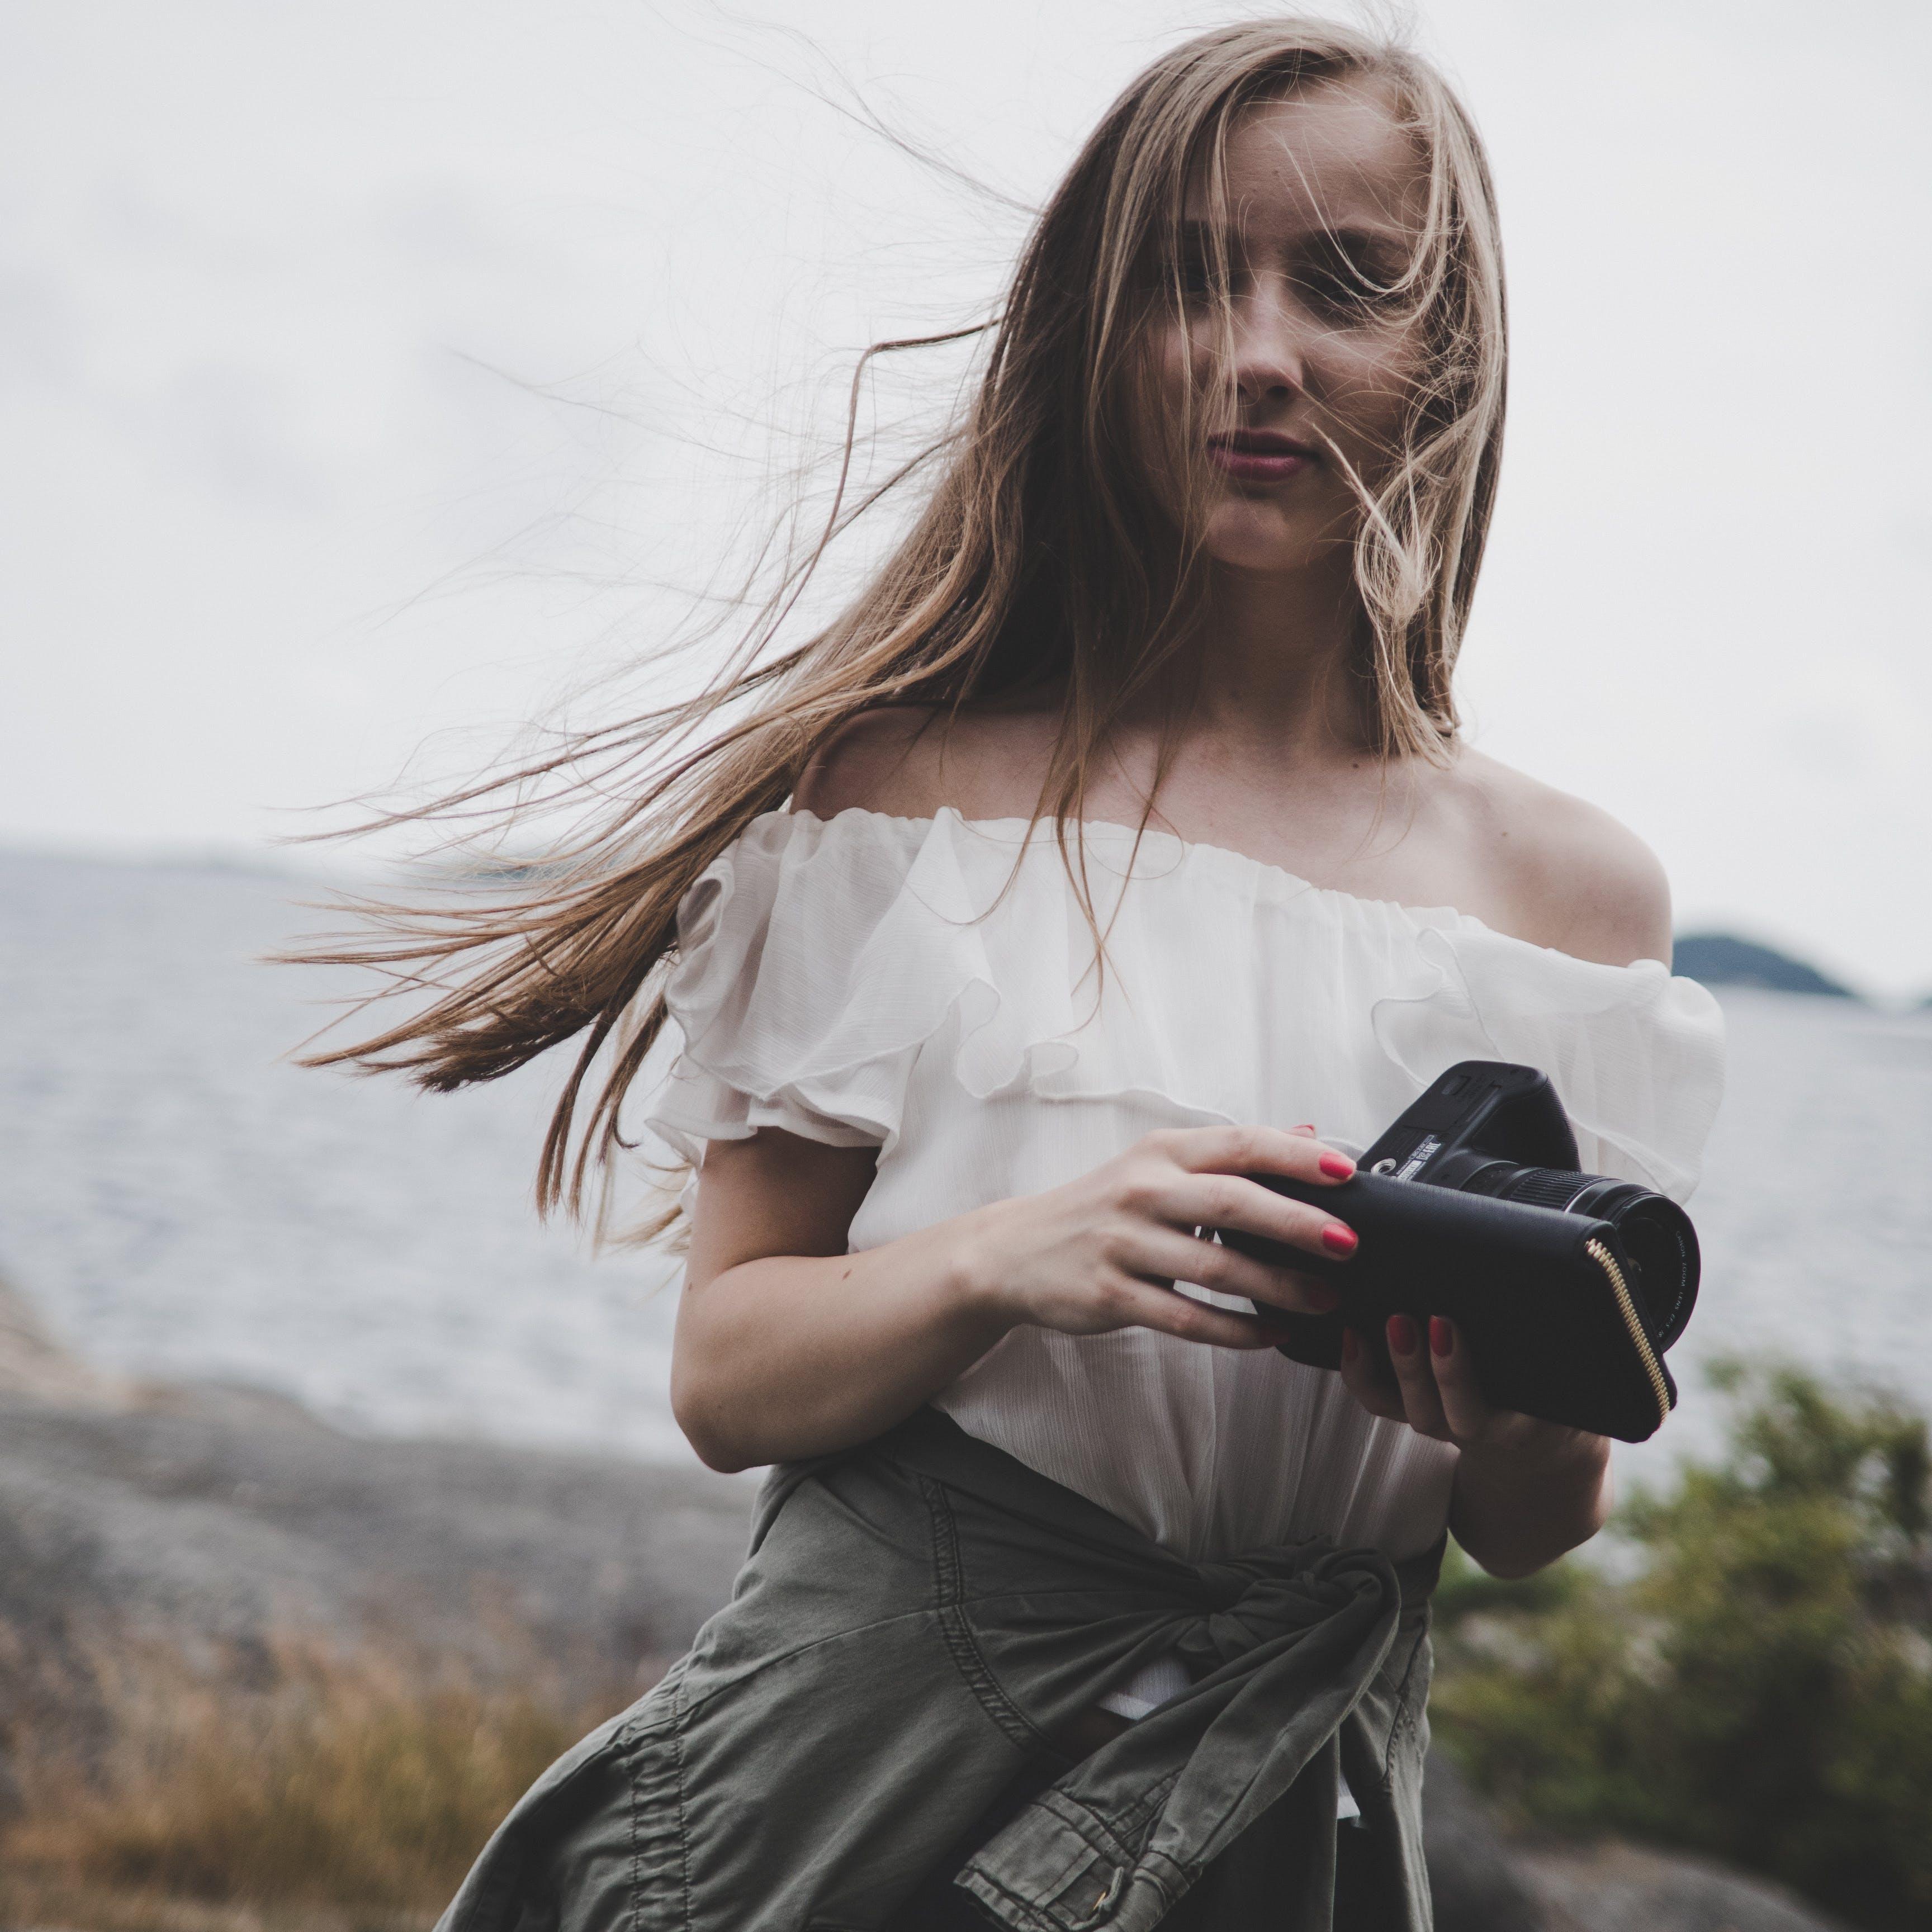 Woman Sitting on Seashore Holding Camera